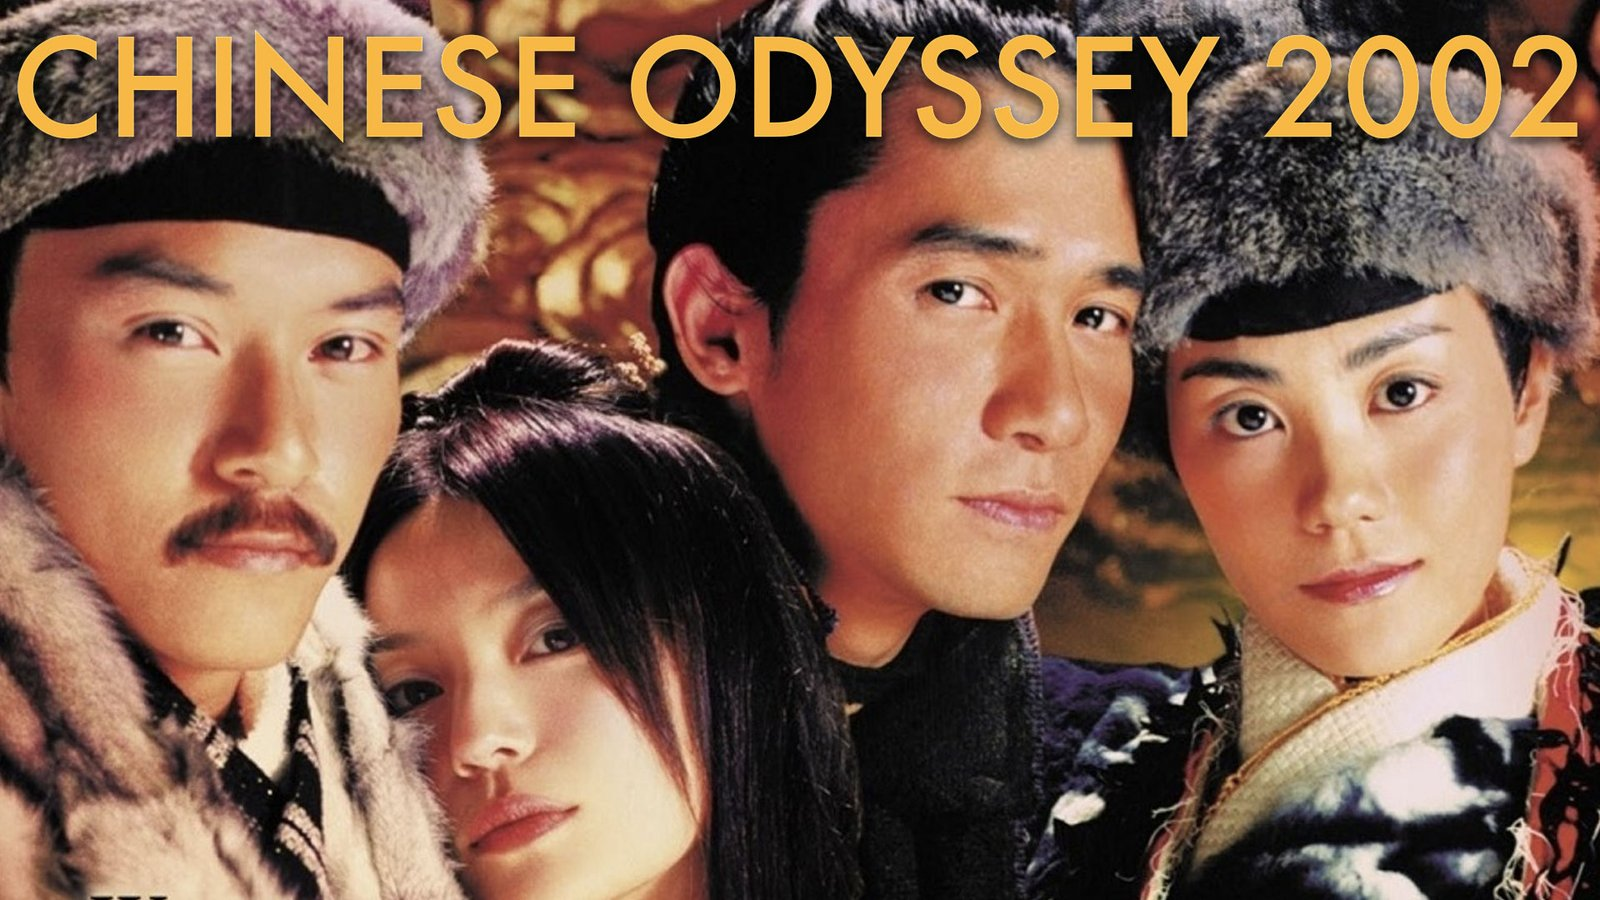 Chinese Odyssey 2002